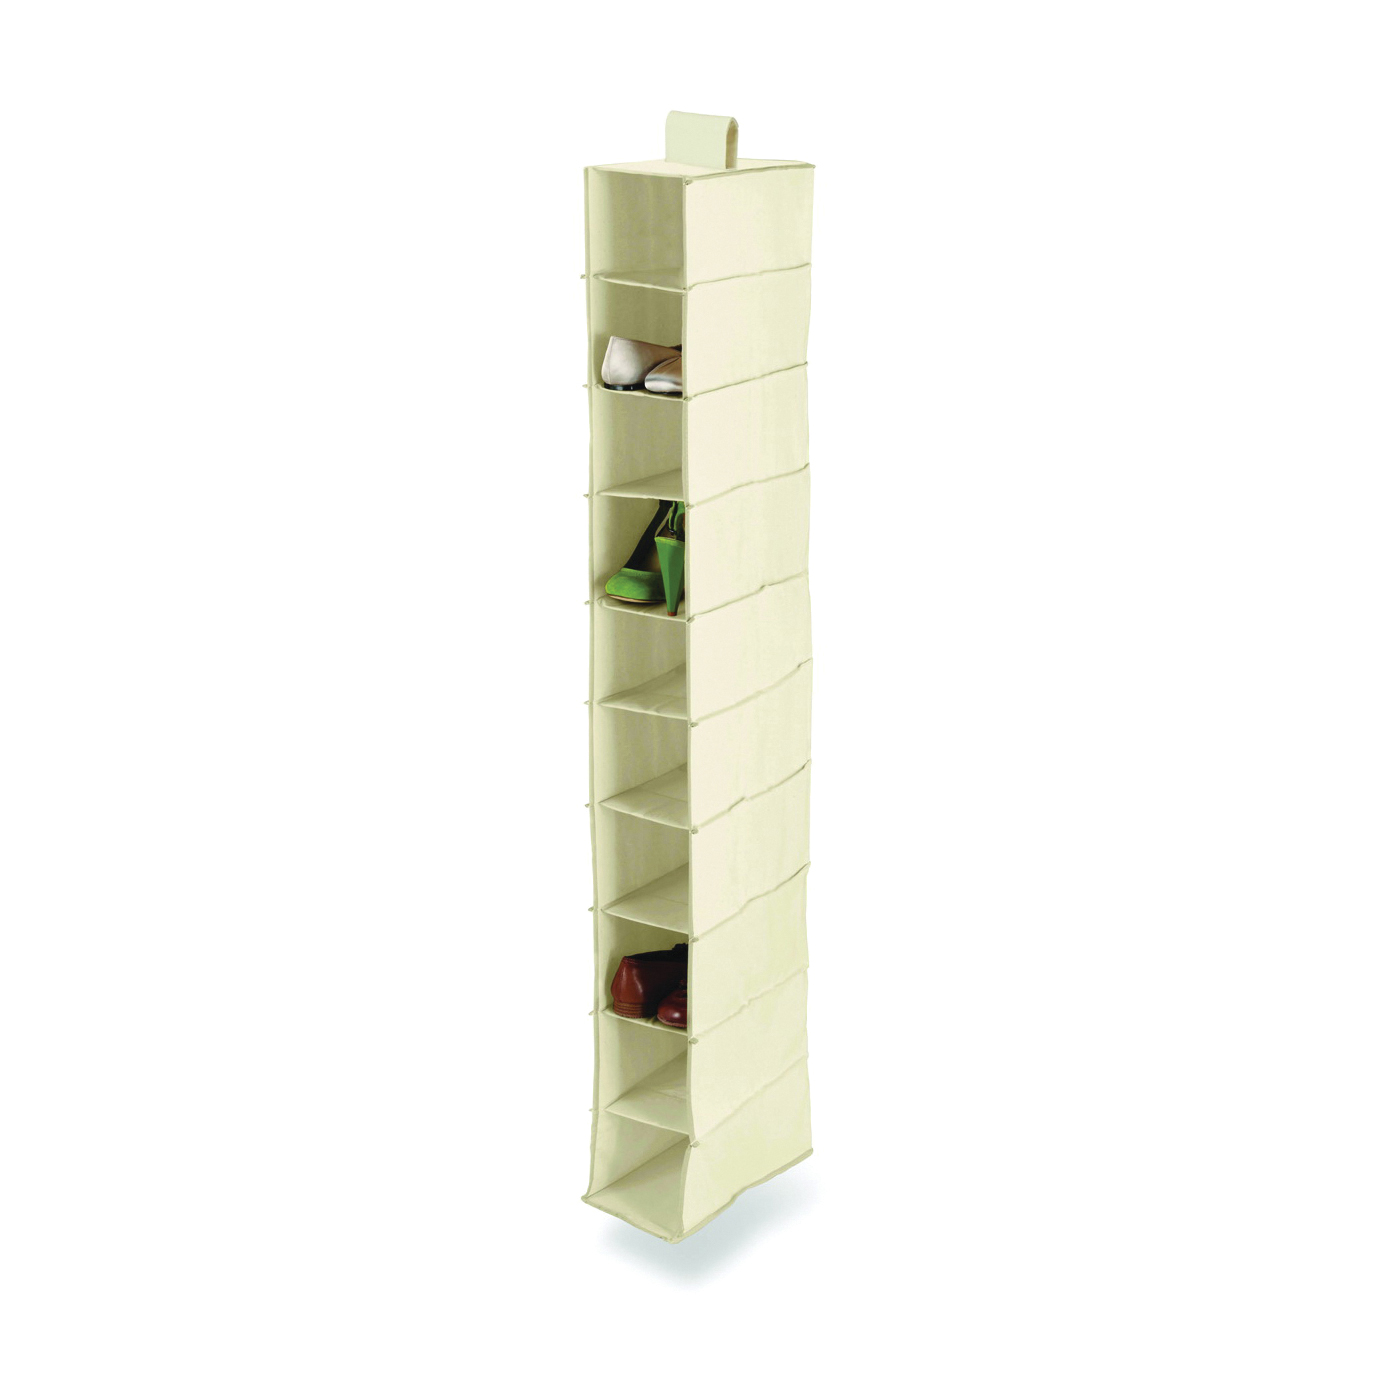 Picture of Honey-Can-Do SFT-01254 Closet Organizer, 12 in W, 54 in H, 10-Shelf, Canvas, Beige